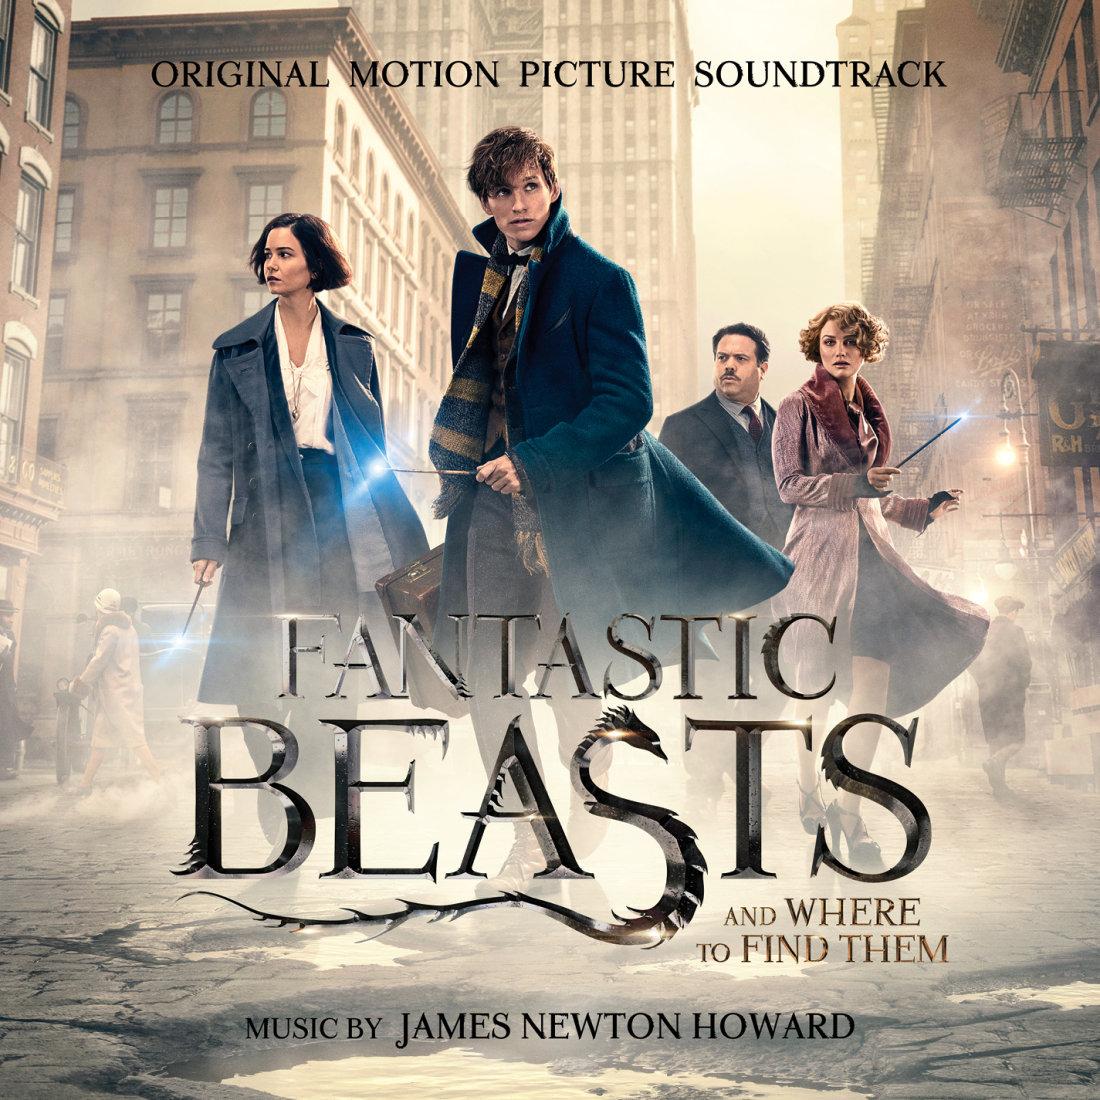 fantastic_beasts_standard_sdtk_cover_01_1425px_rgb.jpg